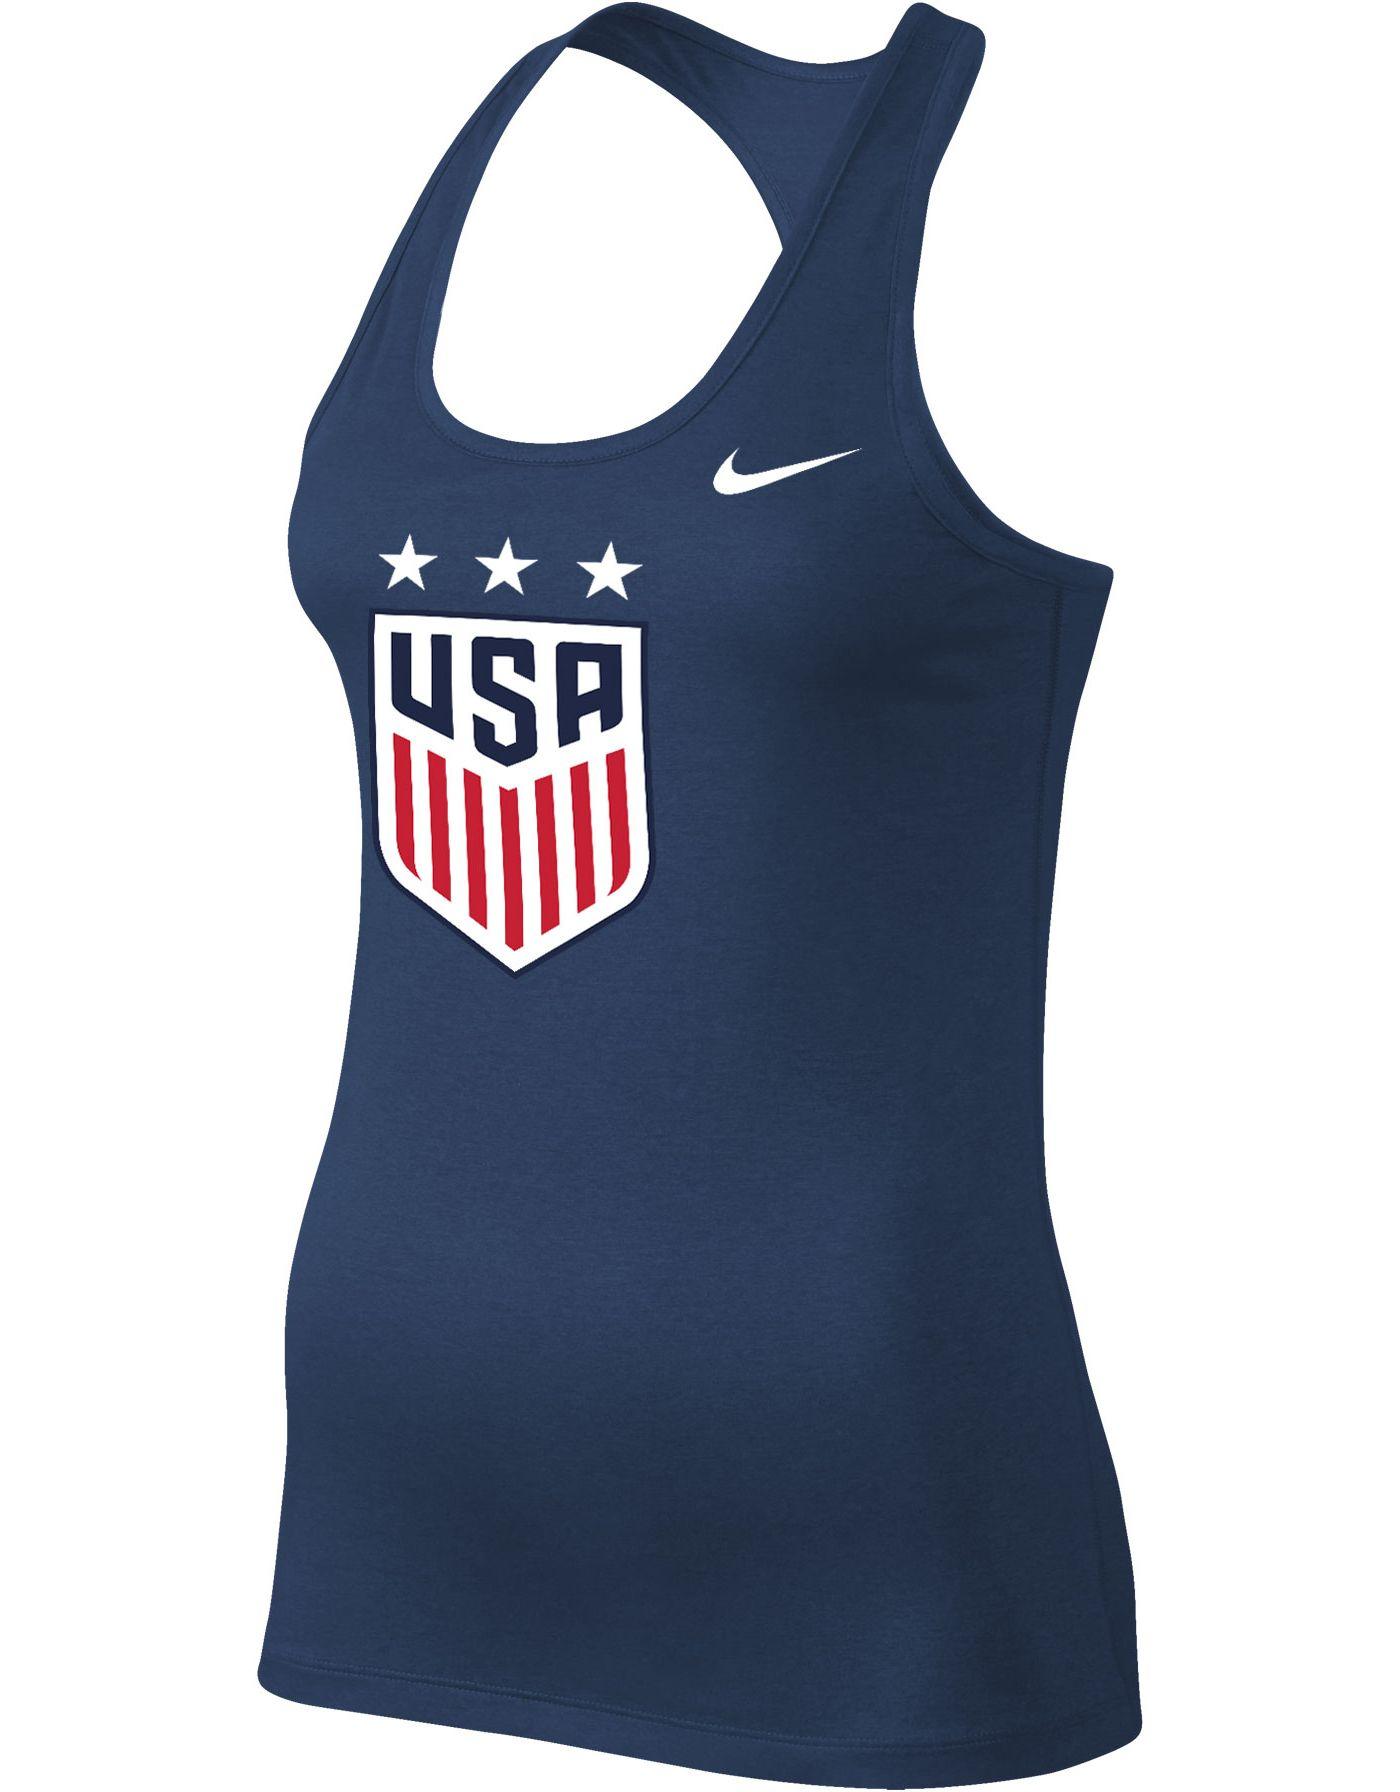 Nike Women's 2019 FIFA Women's World Cup USA Soccer Logo Navy Racerback Tank